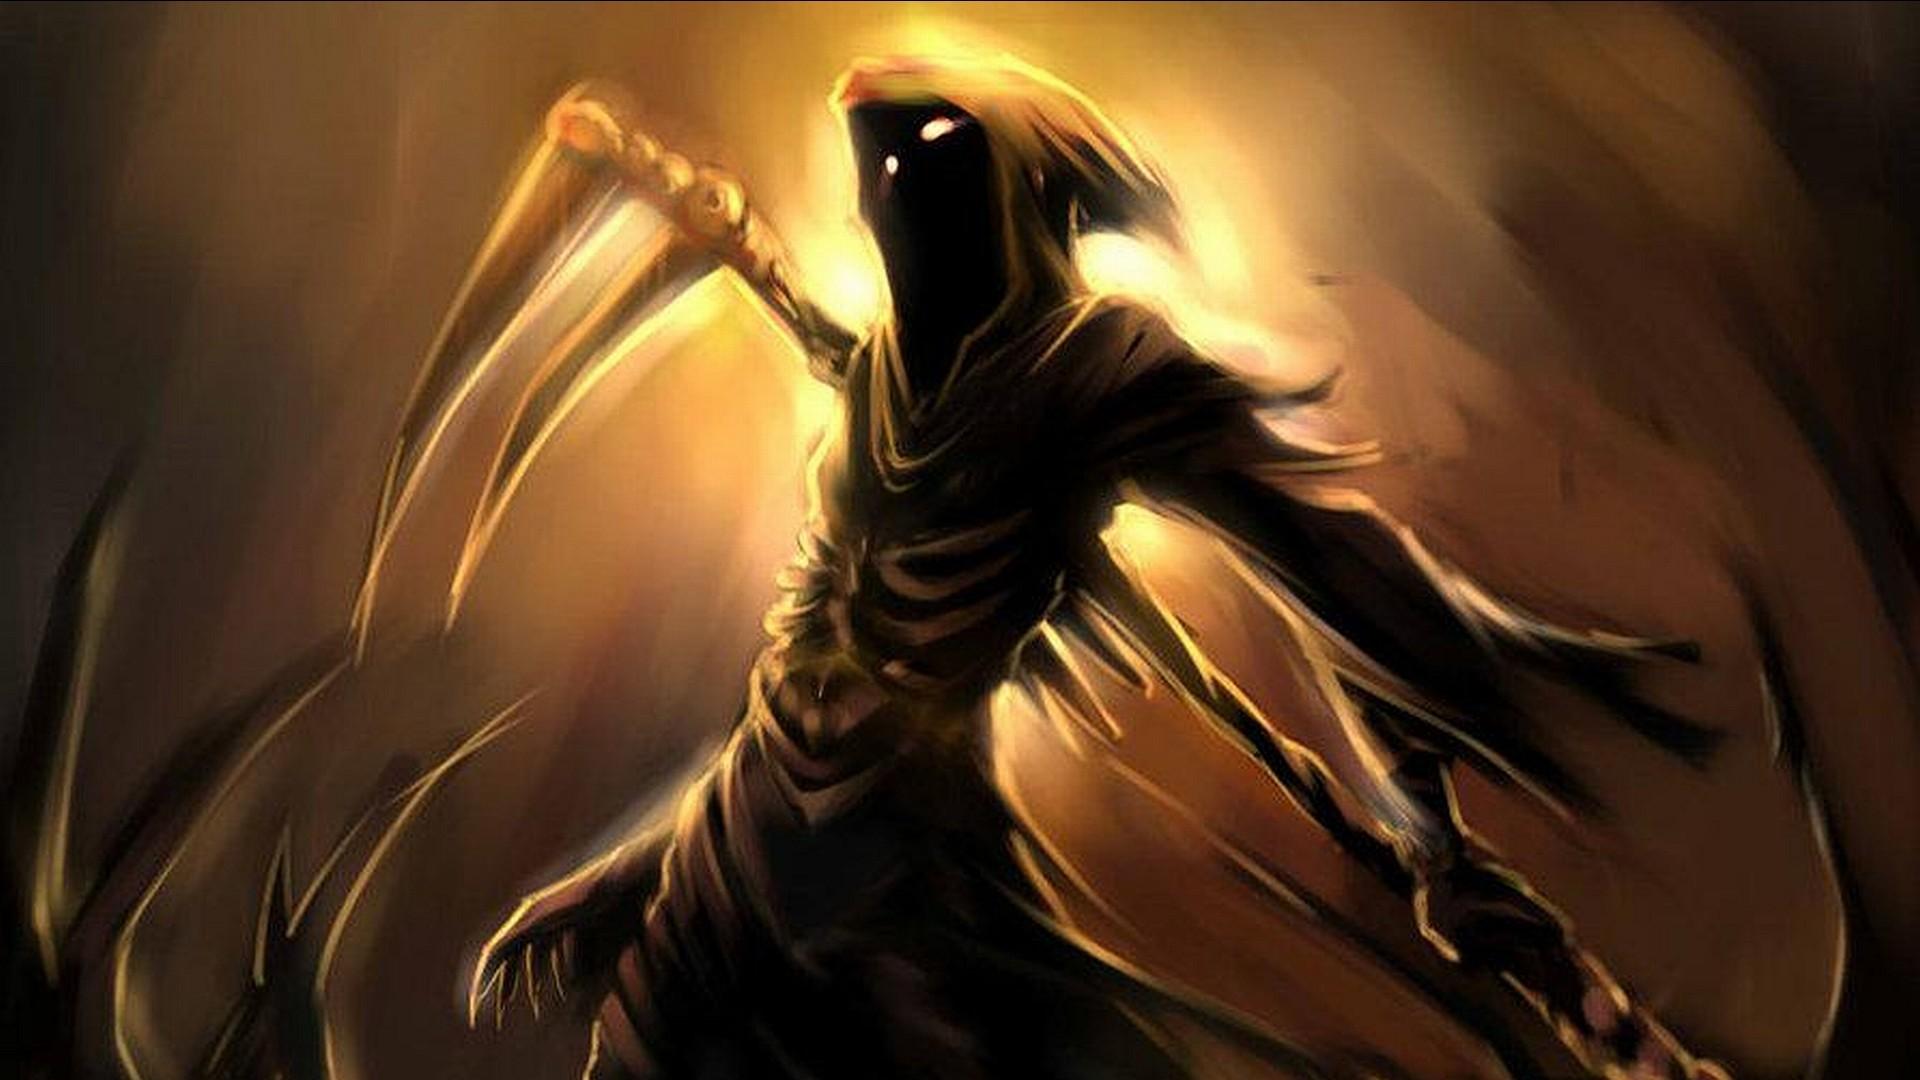 Dark Grim Reaper Horror Skeletons Skull Creepy F Wallpaper At Dark  Wallpapers